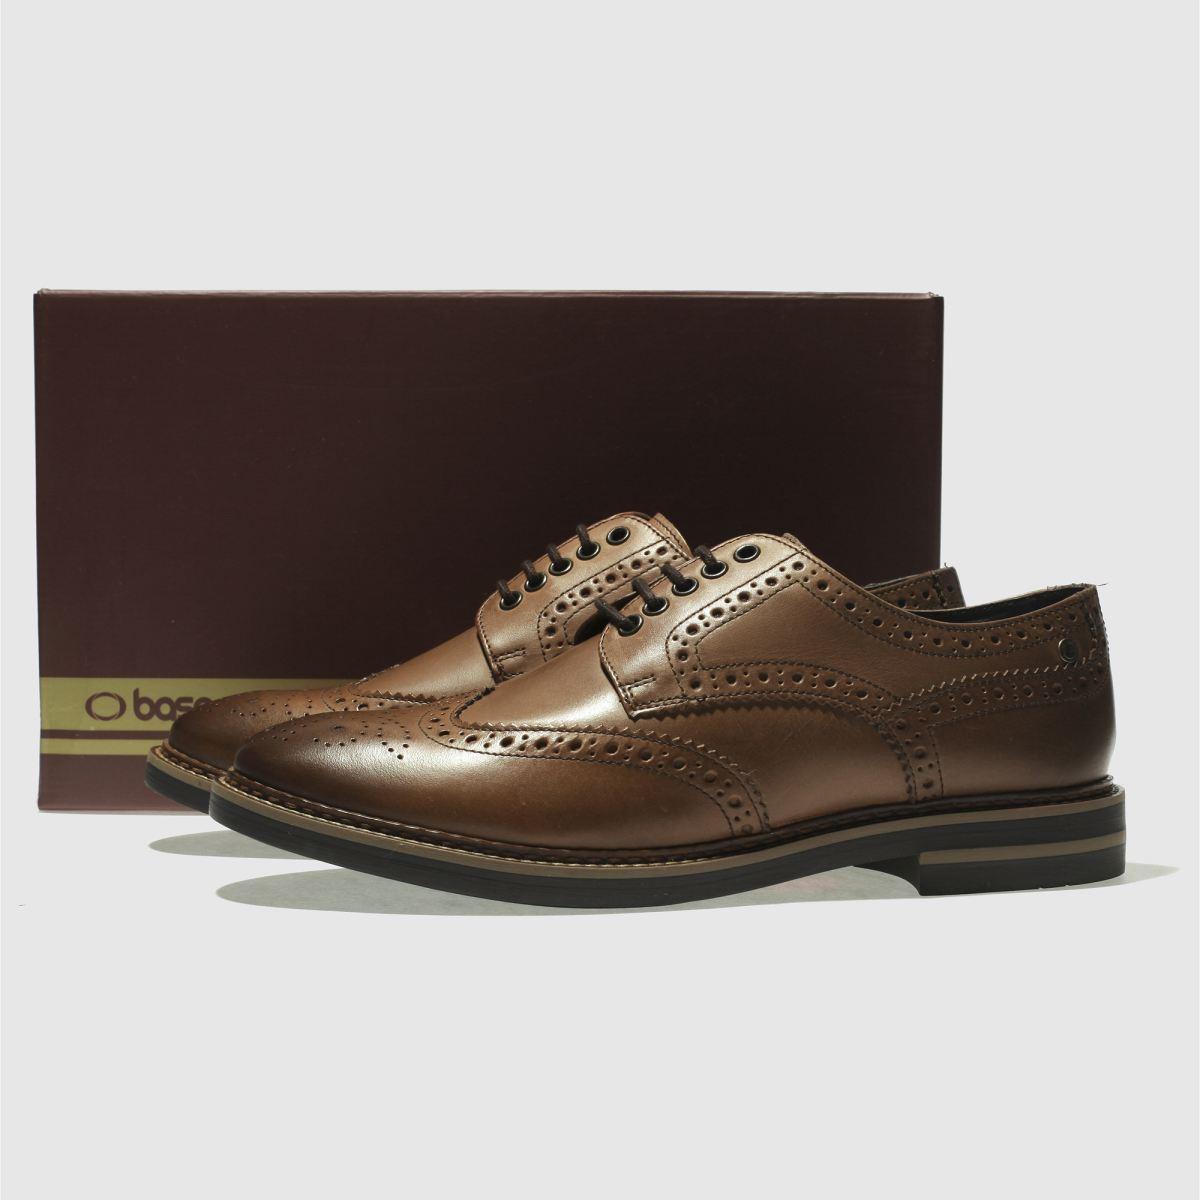 Herren Hellbraun base london Rothko Schuhe   Schuhe schuh Gute Qualität beliebte Schuhe   1f2114